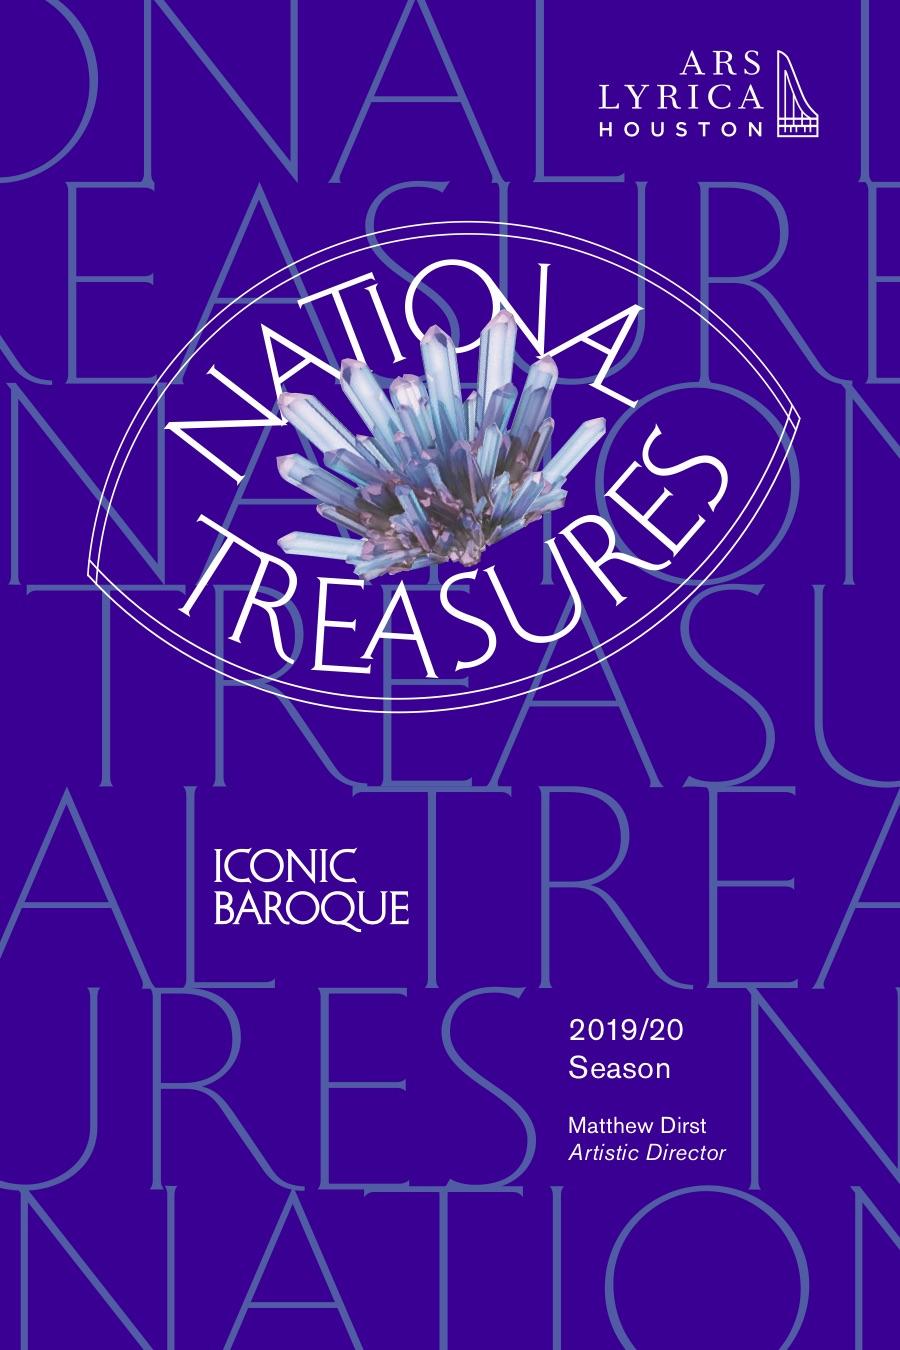 - 2019/20 SEASON BROCHURE